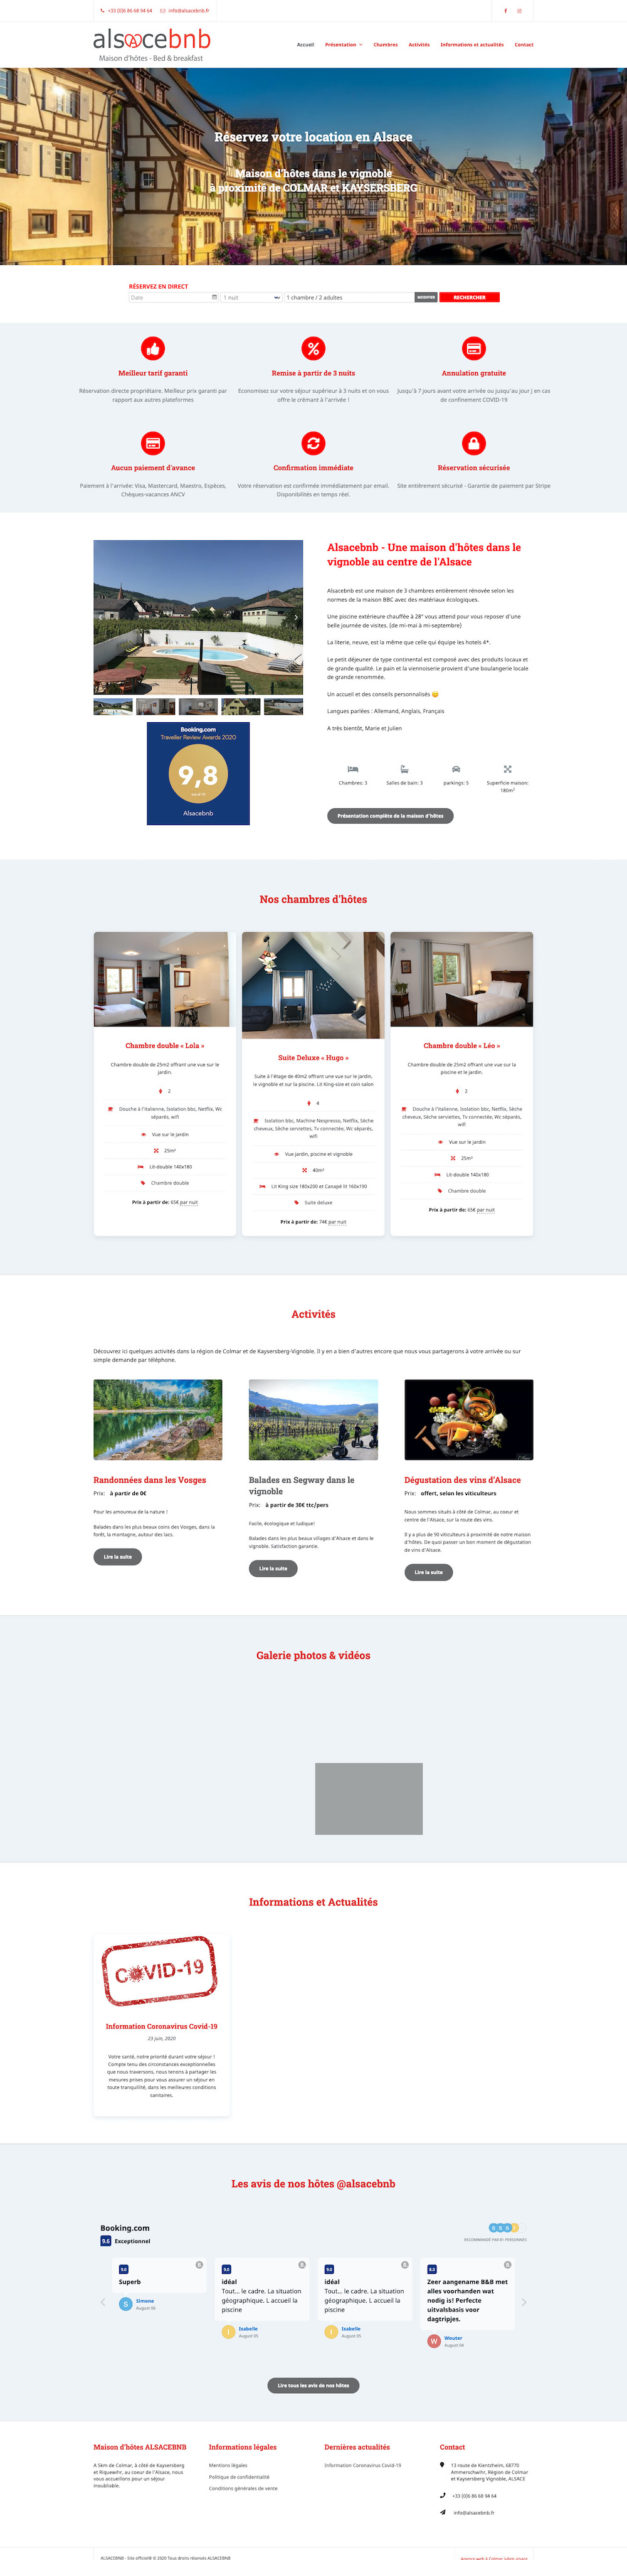 Site internet chambres d'hôtes Alsacebnb